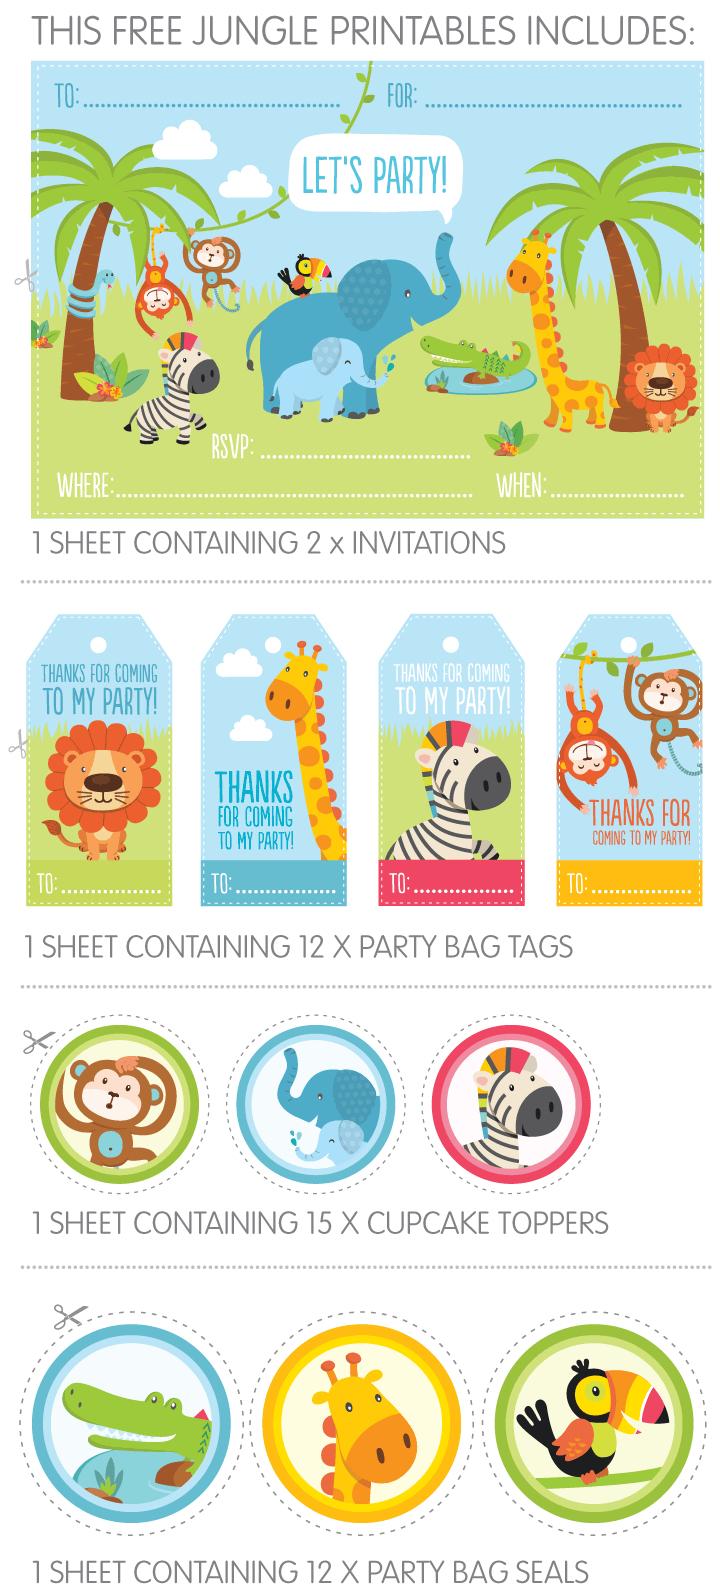 Free Jungle Party Invitation Printables | Safari | Pinterest - Jungle Theme Birthday Invitations Free Printable